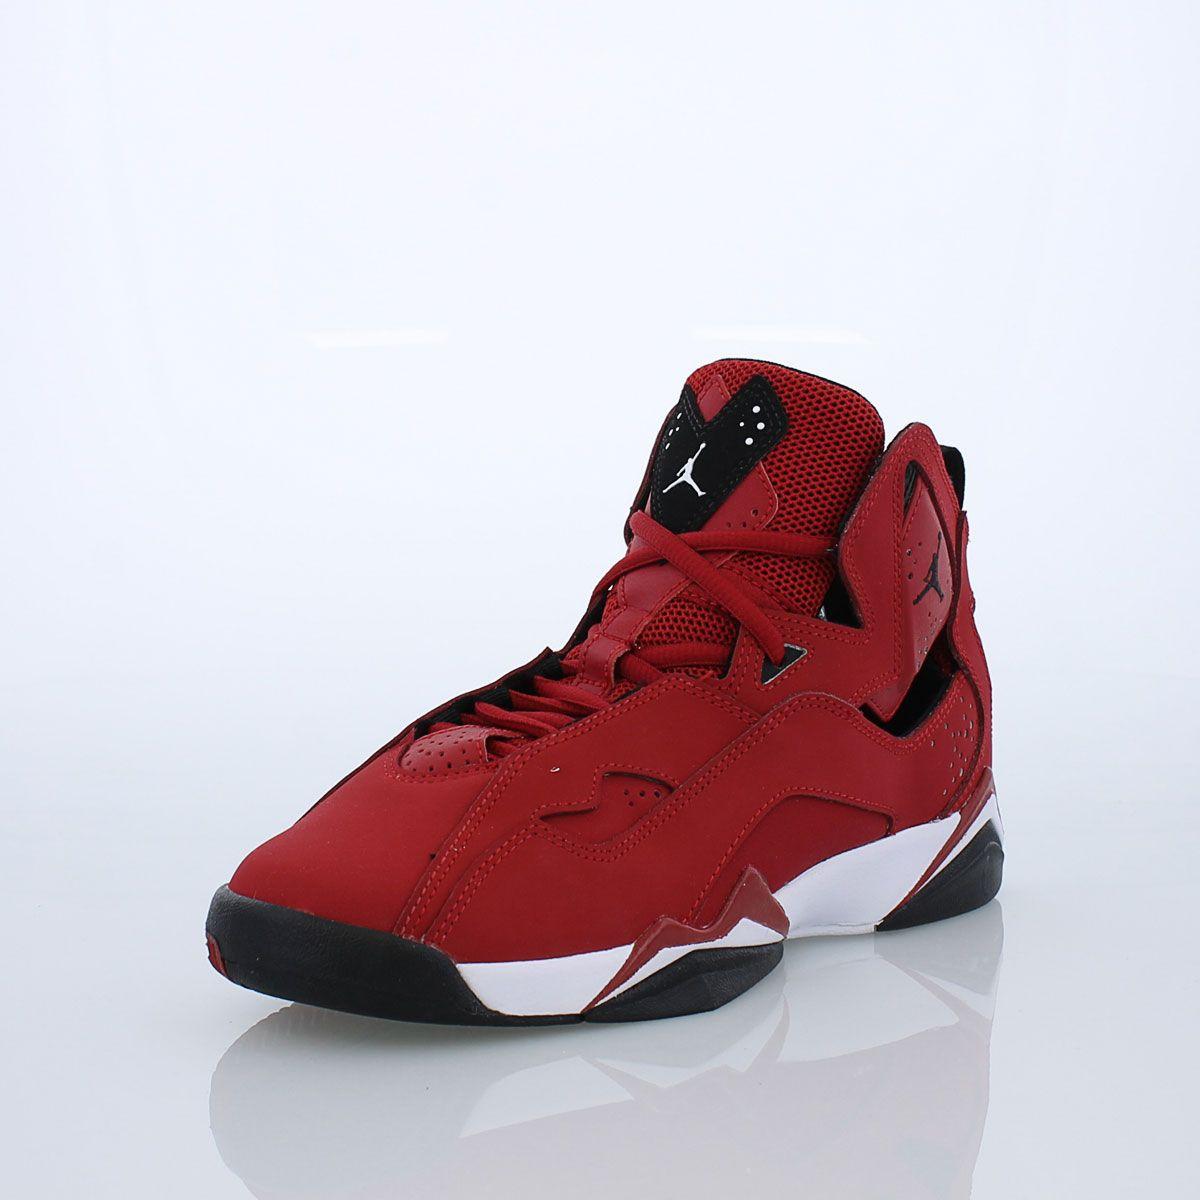 ca8681eeee56 ... aliexpress nike boys grade school jordan true flight basketball shoes  boys cc5f5 01f6a